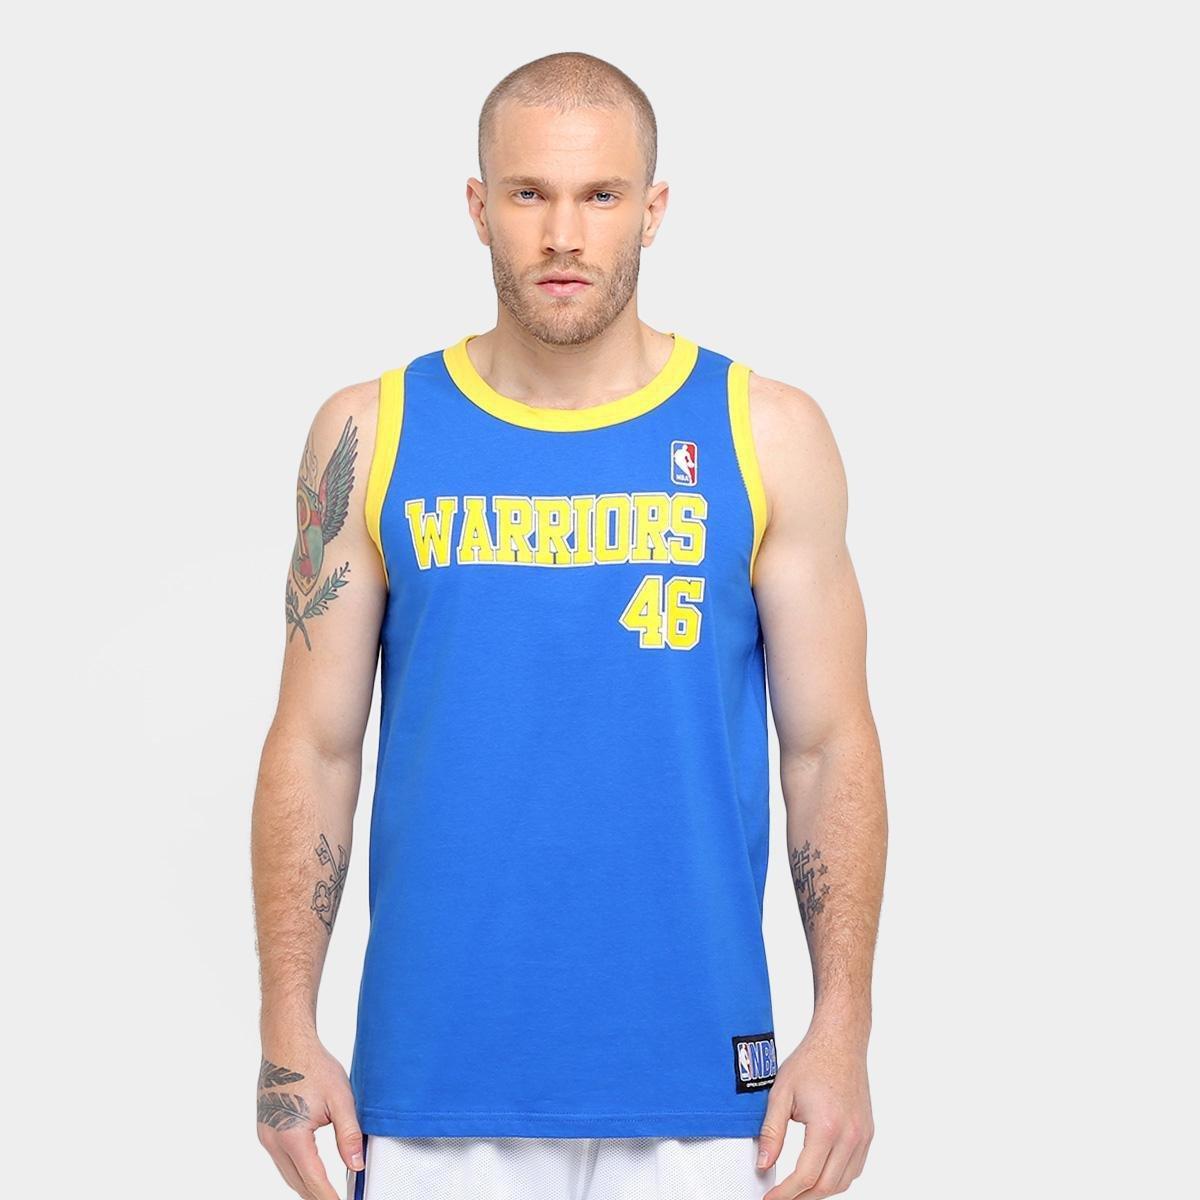 52437b765 Camiseta Regata Retrô NBA Golden State Warriors - Compre Agora ...